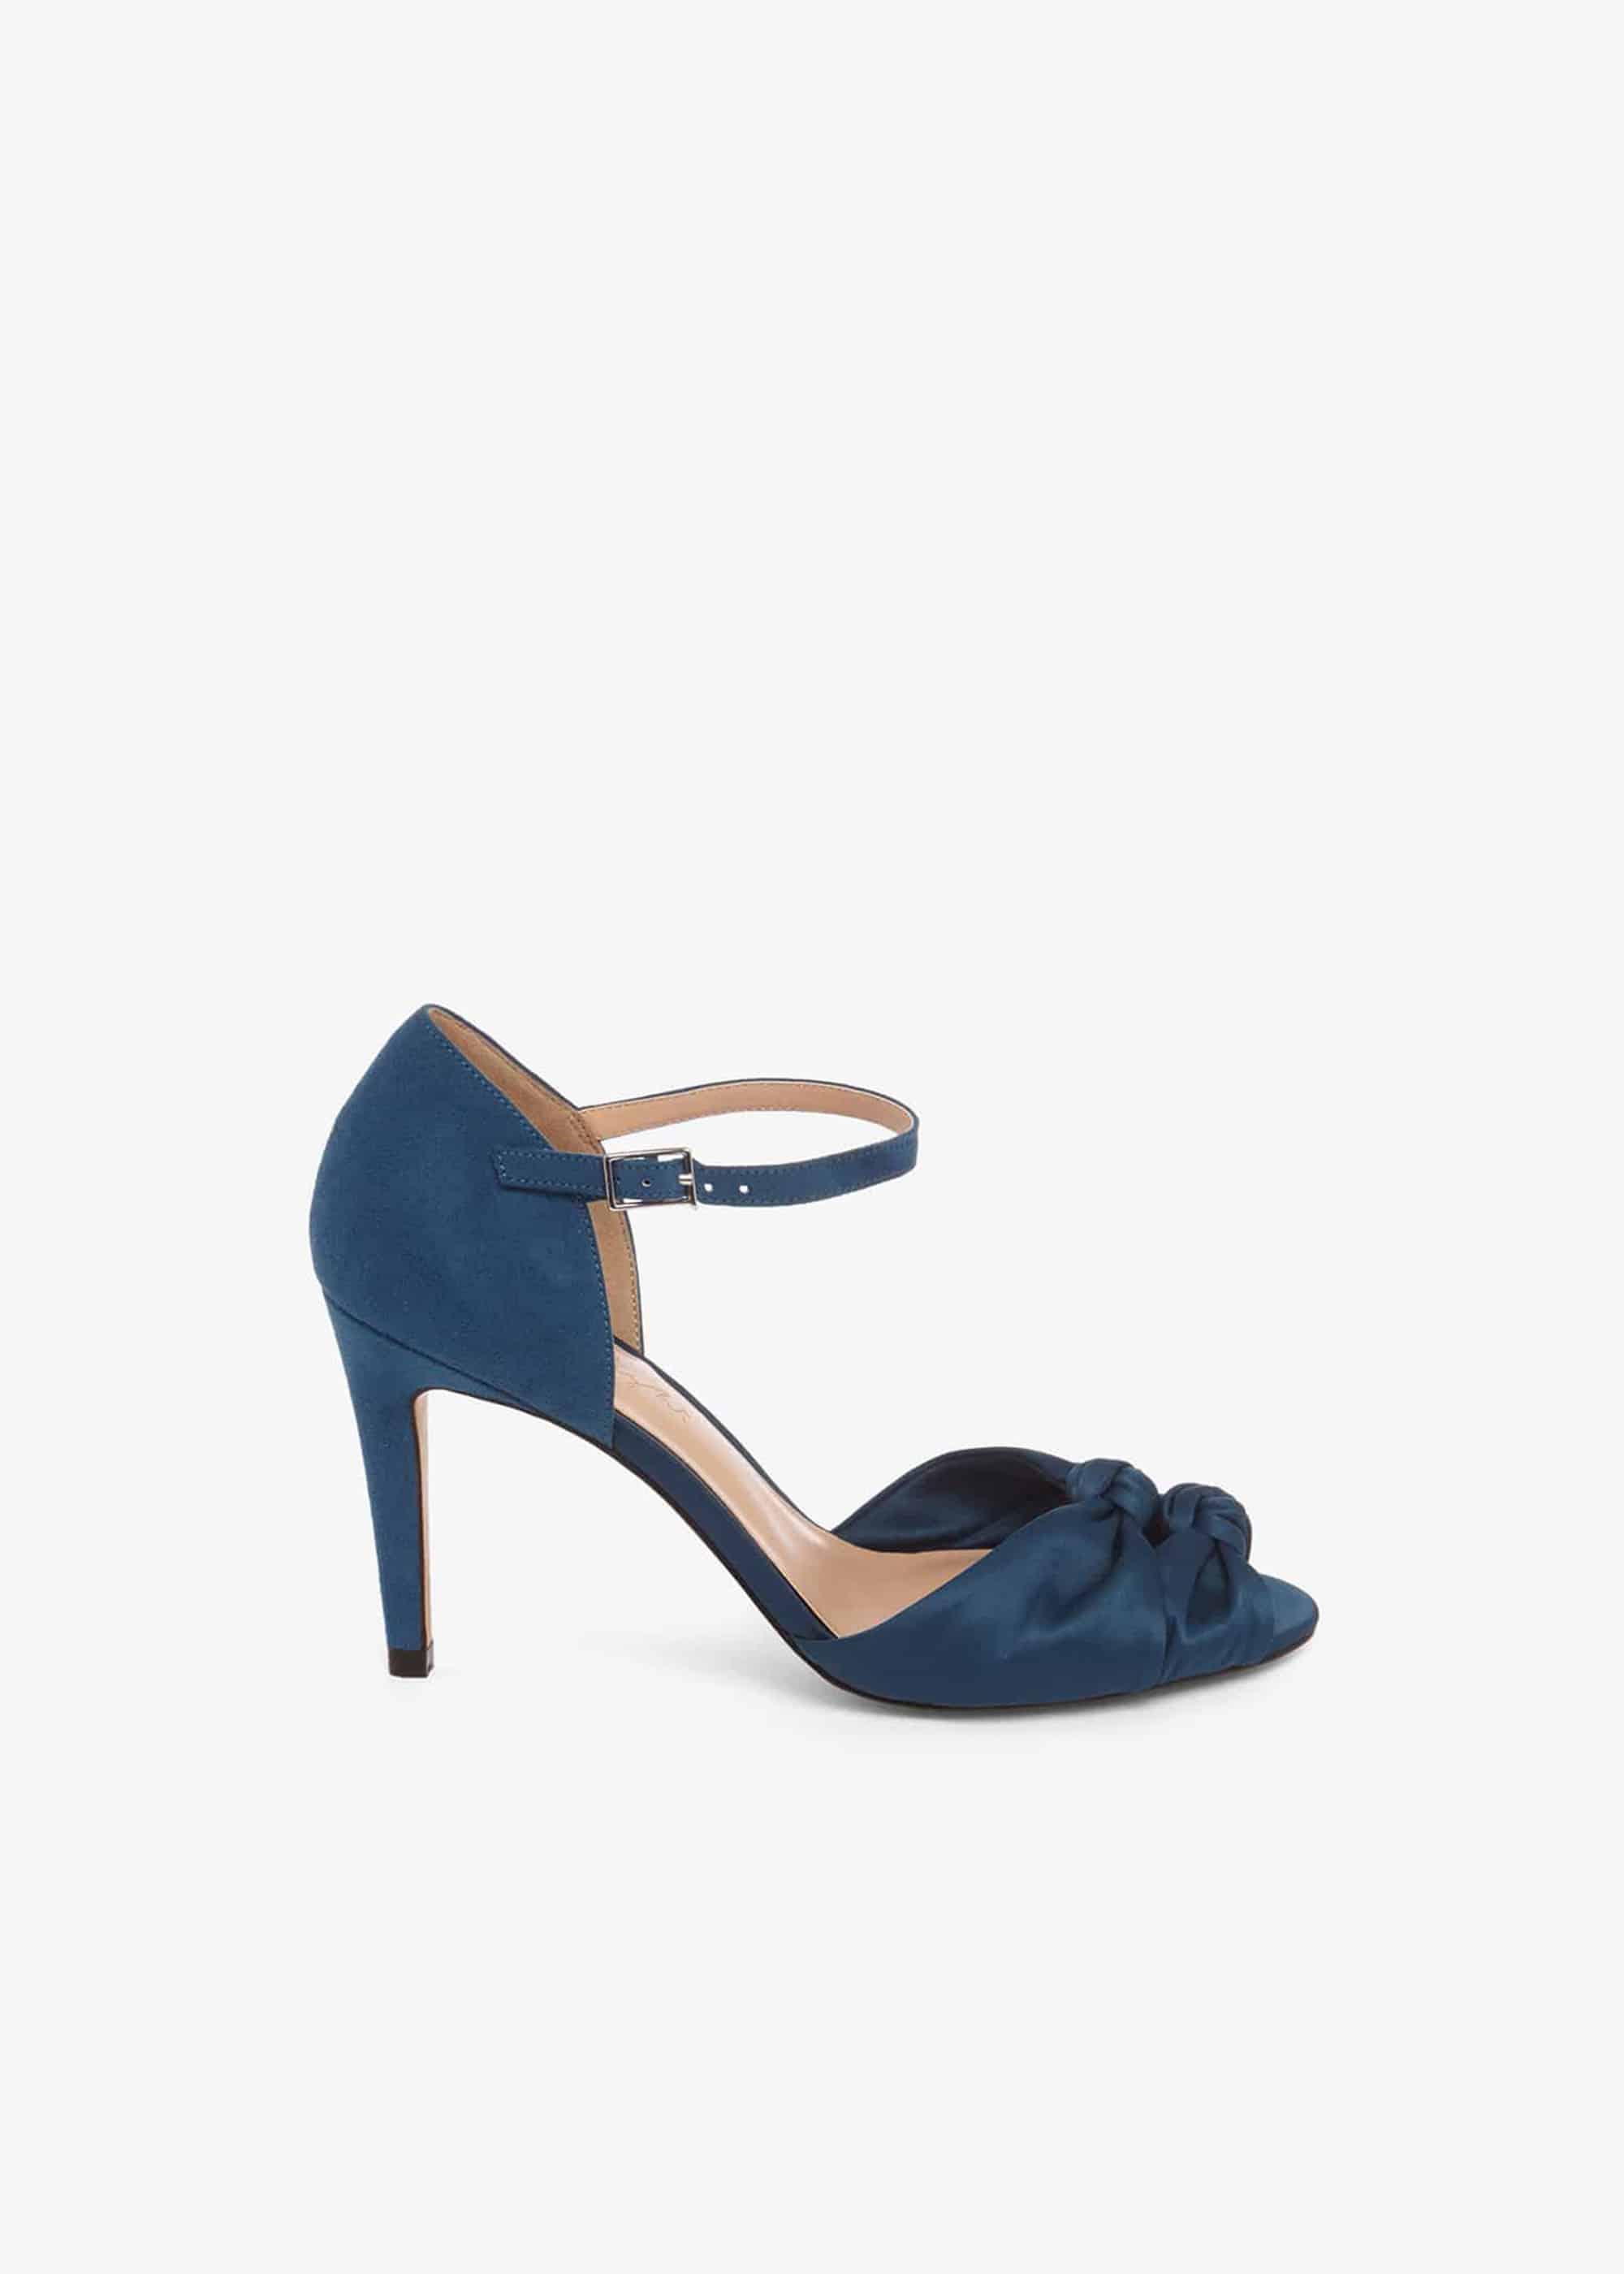 Phase Eight Women Bonnie Knot Peep Toe Sandals